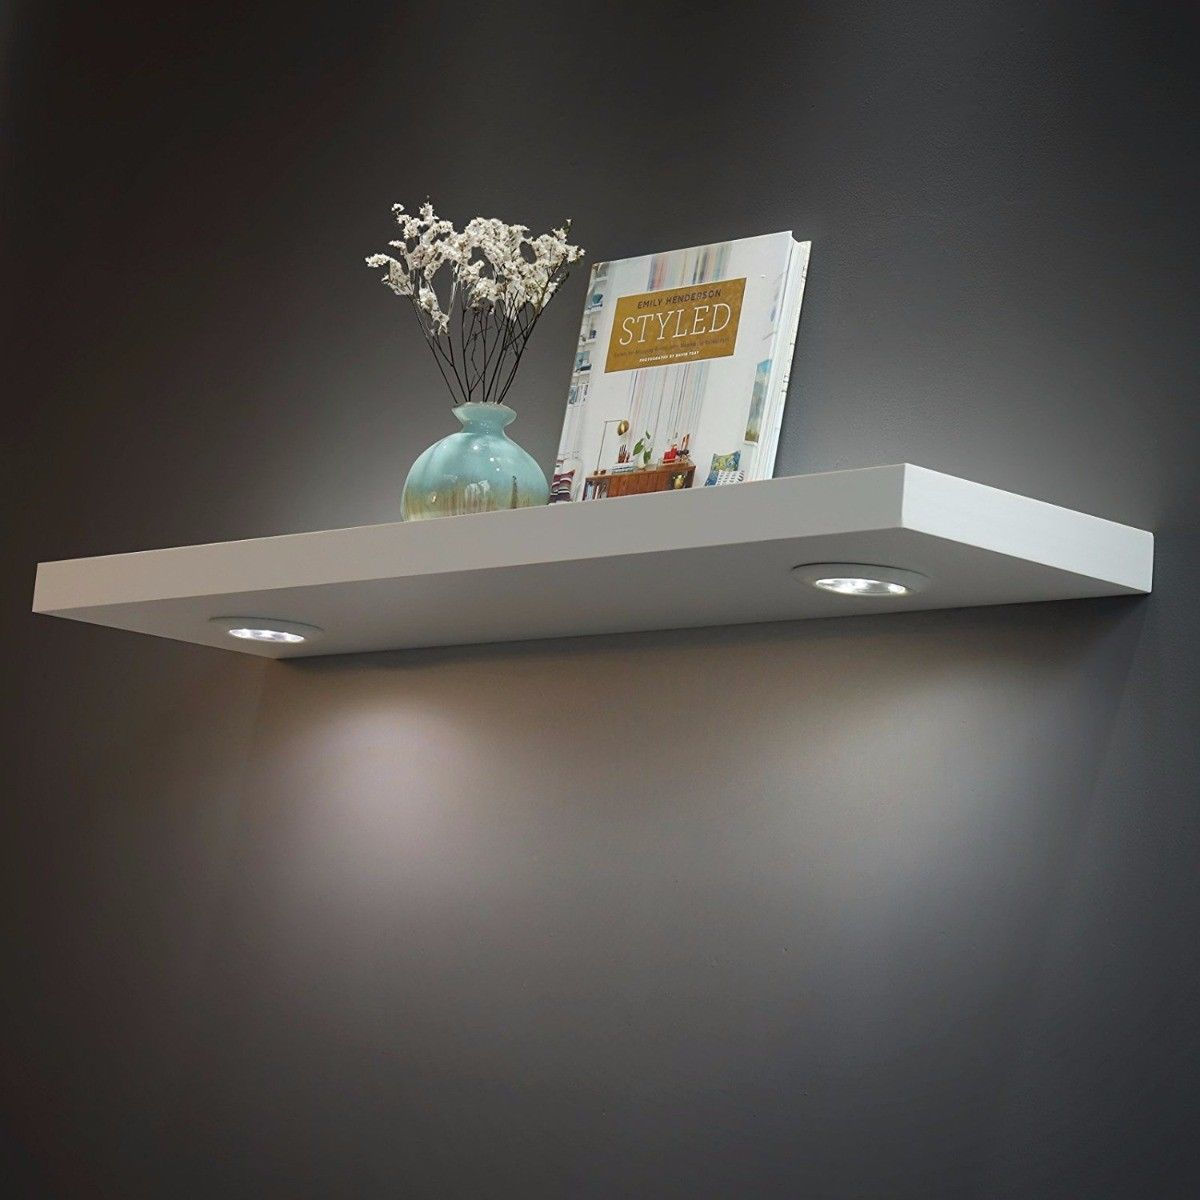 welland floating wall shelf with led lights white shelves lighting computer desk elbow elastilon strong reviews vintage coat hanger ledge moulding granite island brackets ikea